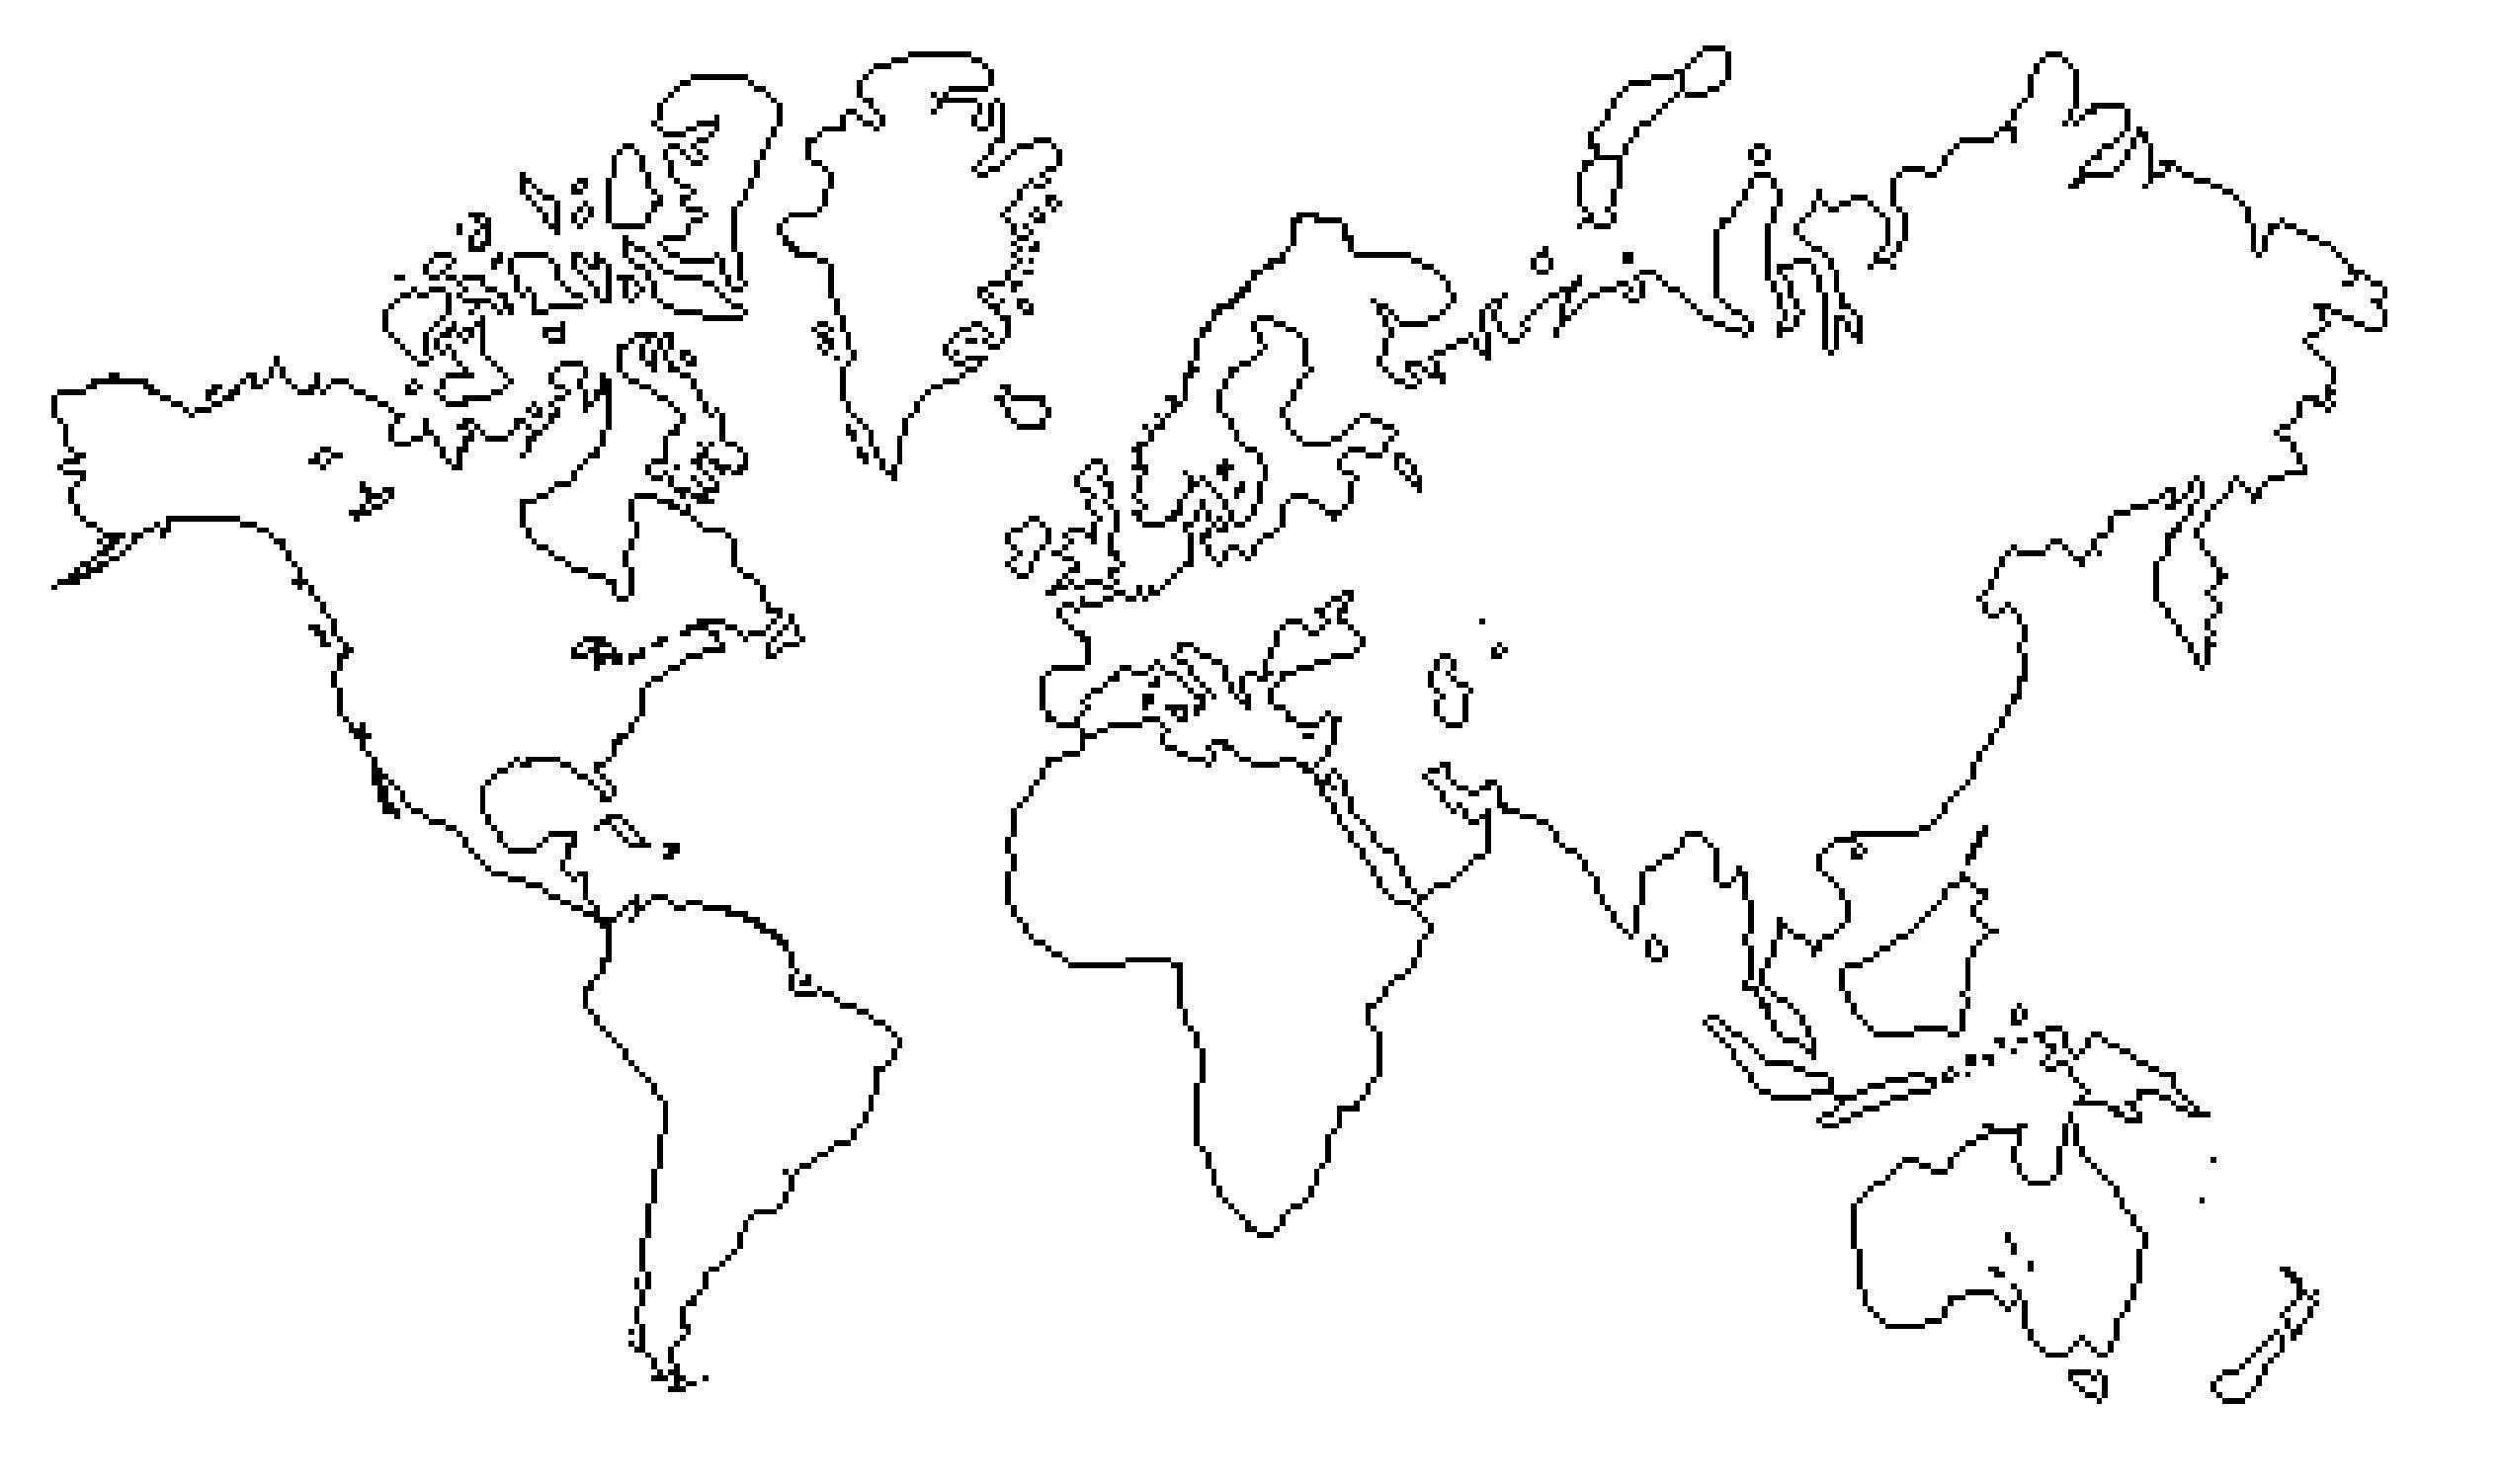 World Map Vector Line Art Best Outline Easy To Draw Fresh